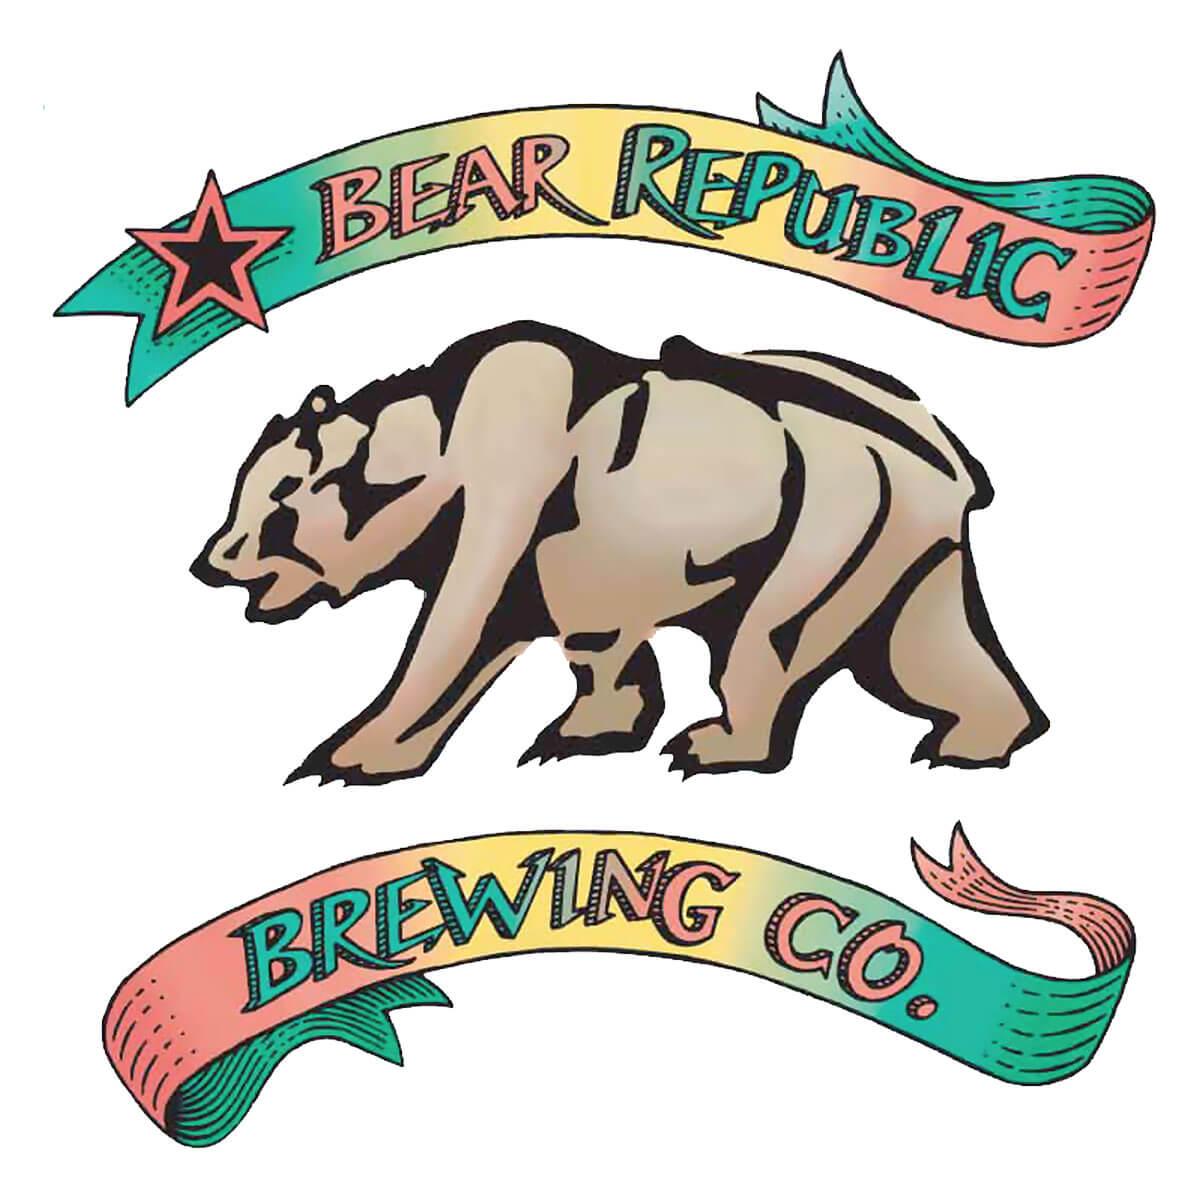 Bear Republic Brewing Co. Logo